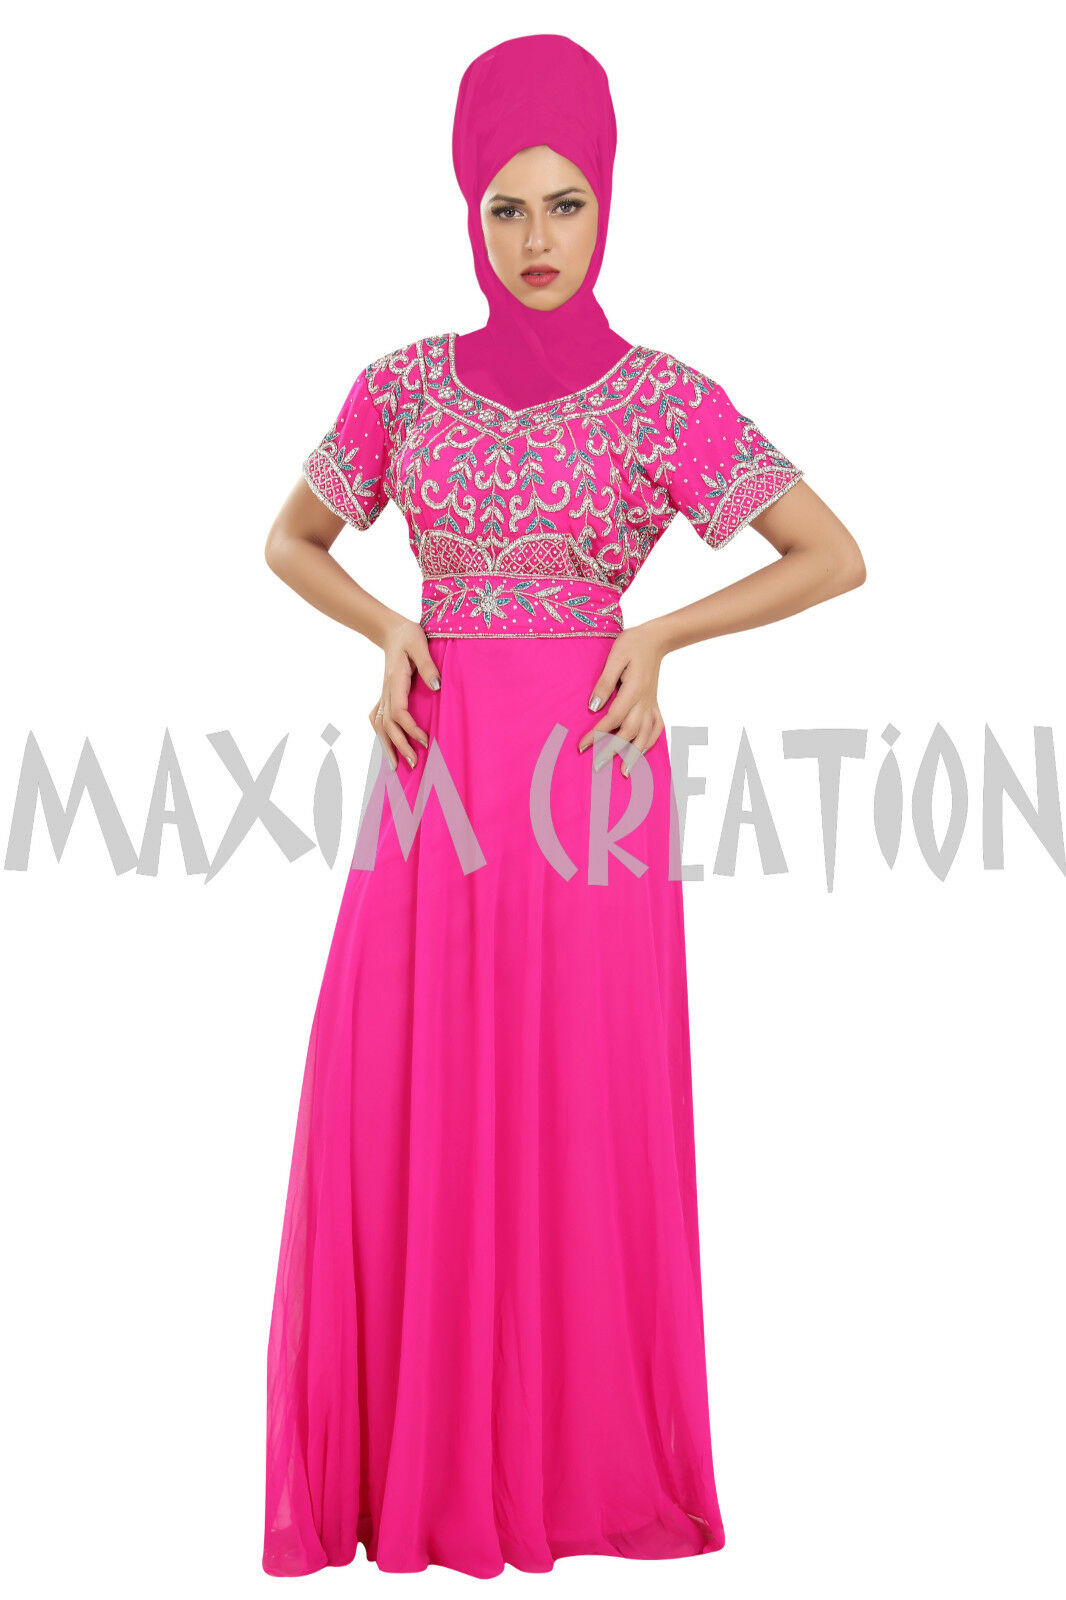 EXCLUSIVE TRADITIONAL MODERN DUBAI DAILY HOME WEAR KAFTAN ISLAMIC DRESS 6555